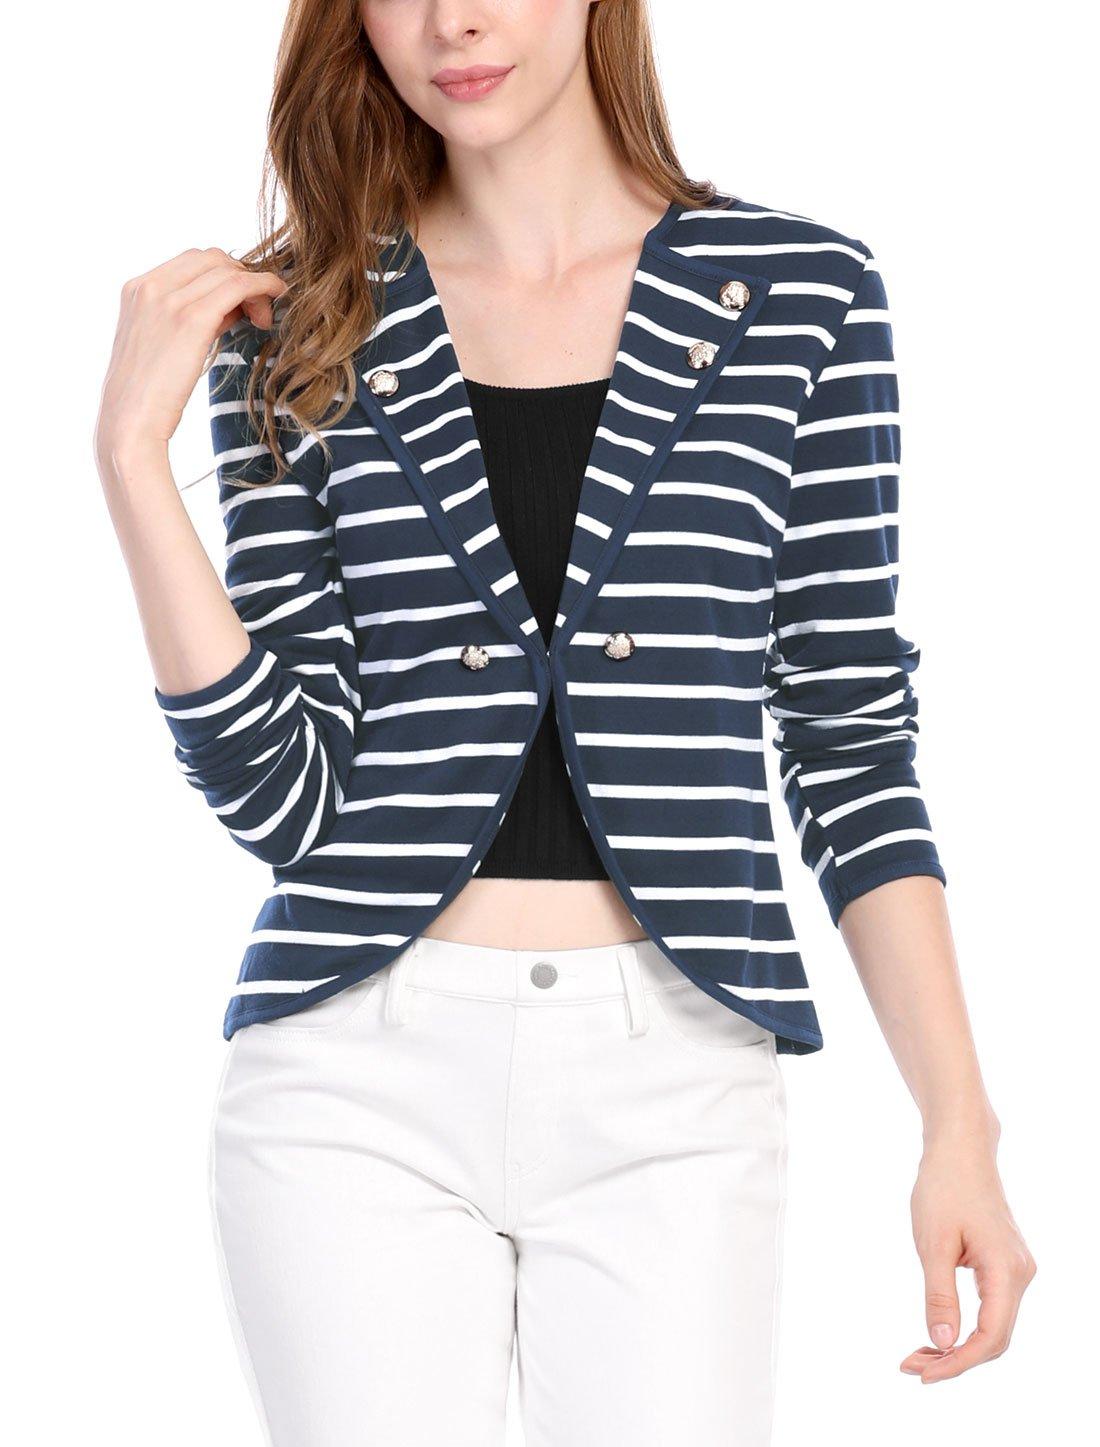 Allegra K Women's Notched Lapel Button Decor Striped Blazer L Blue White